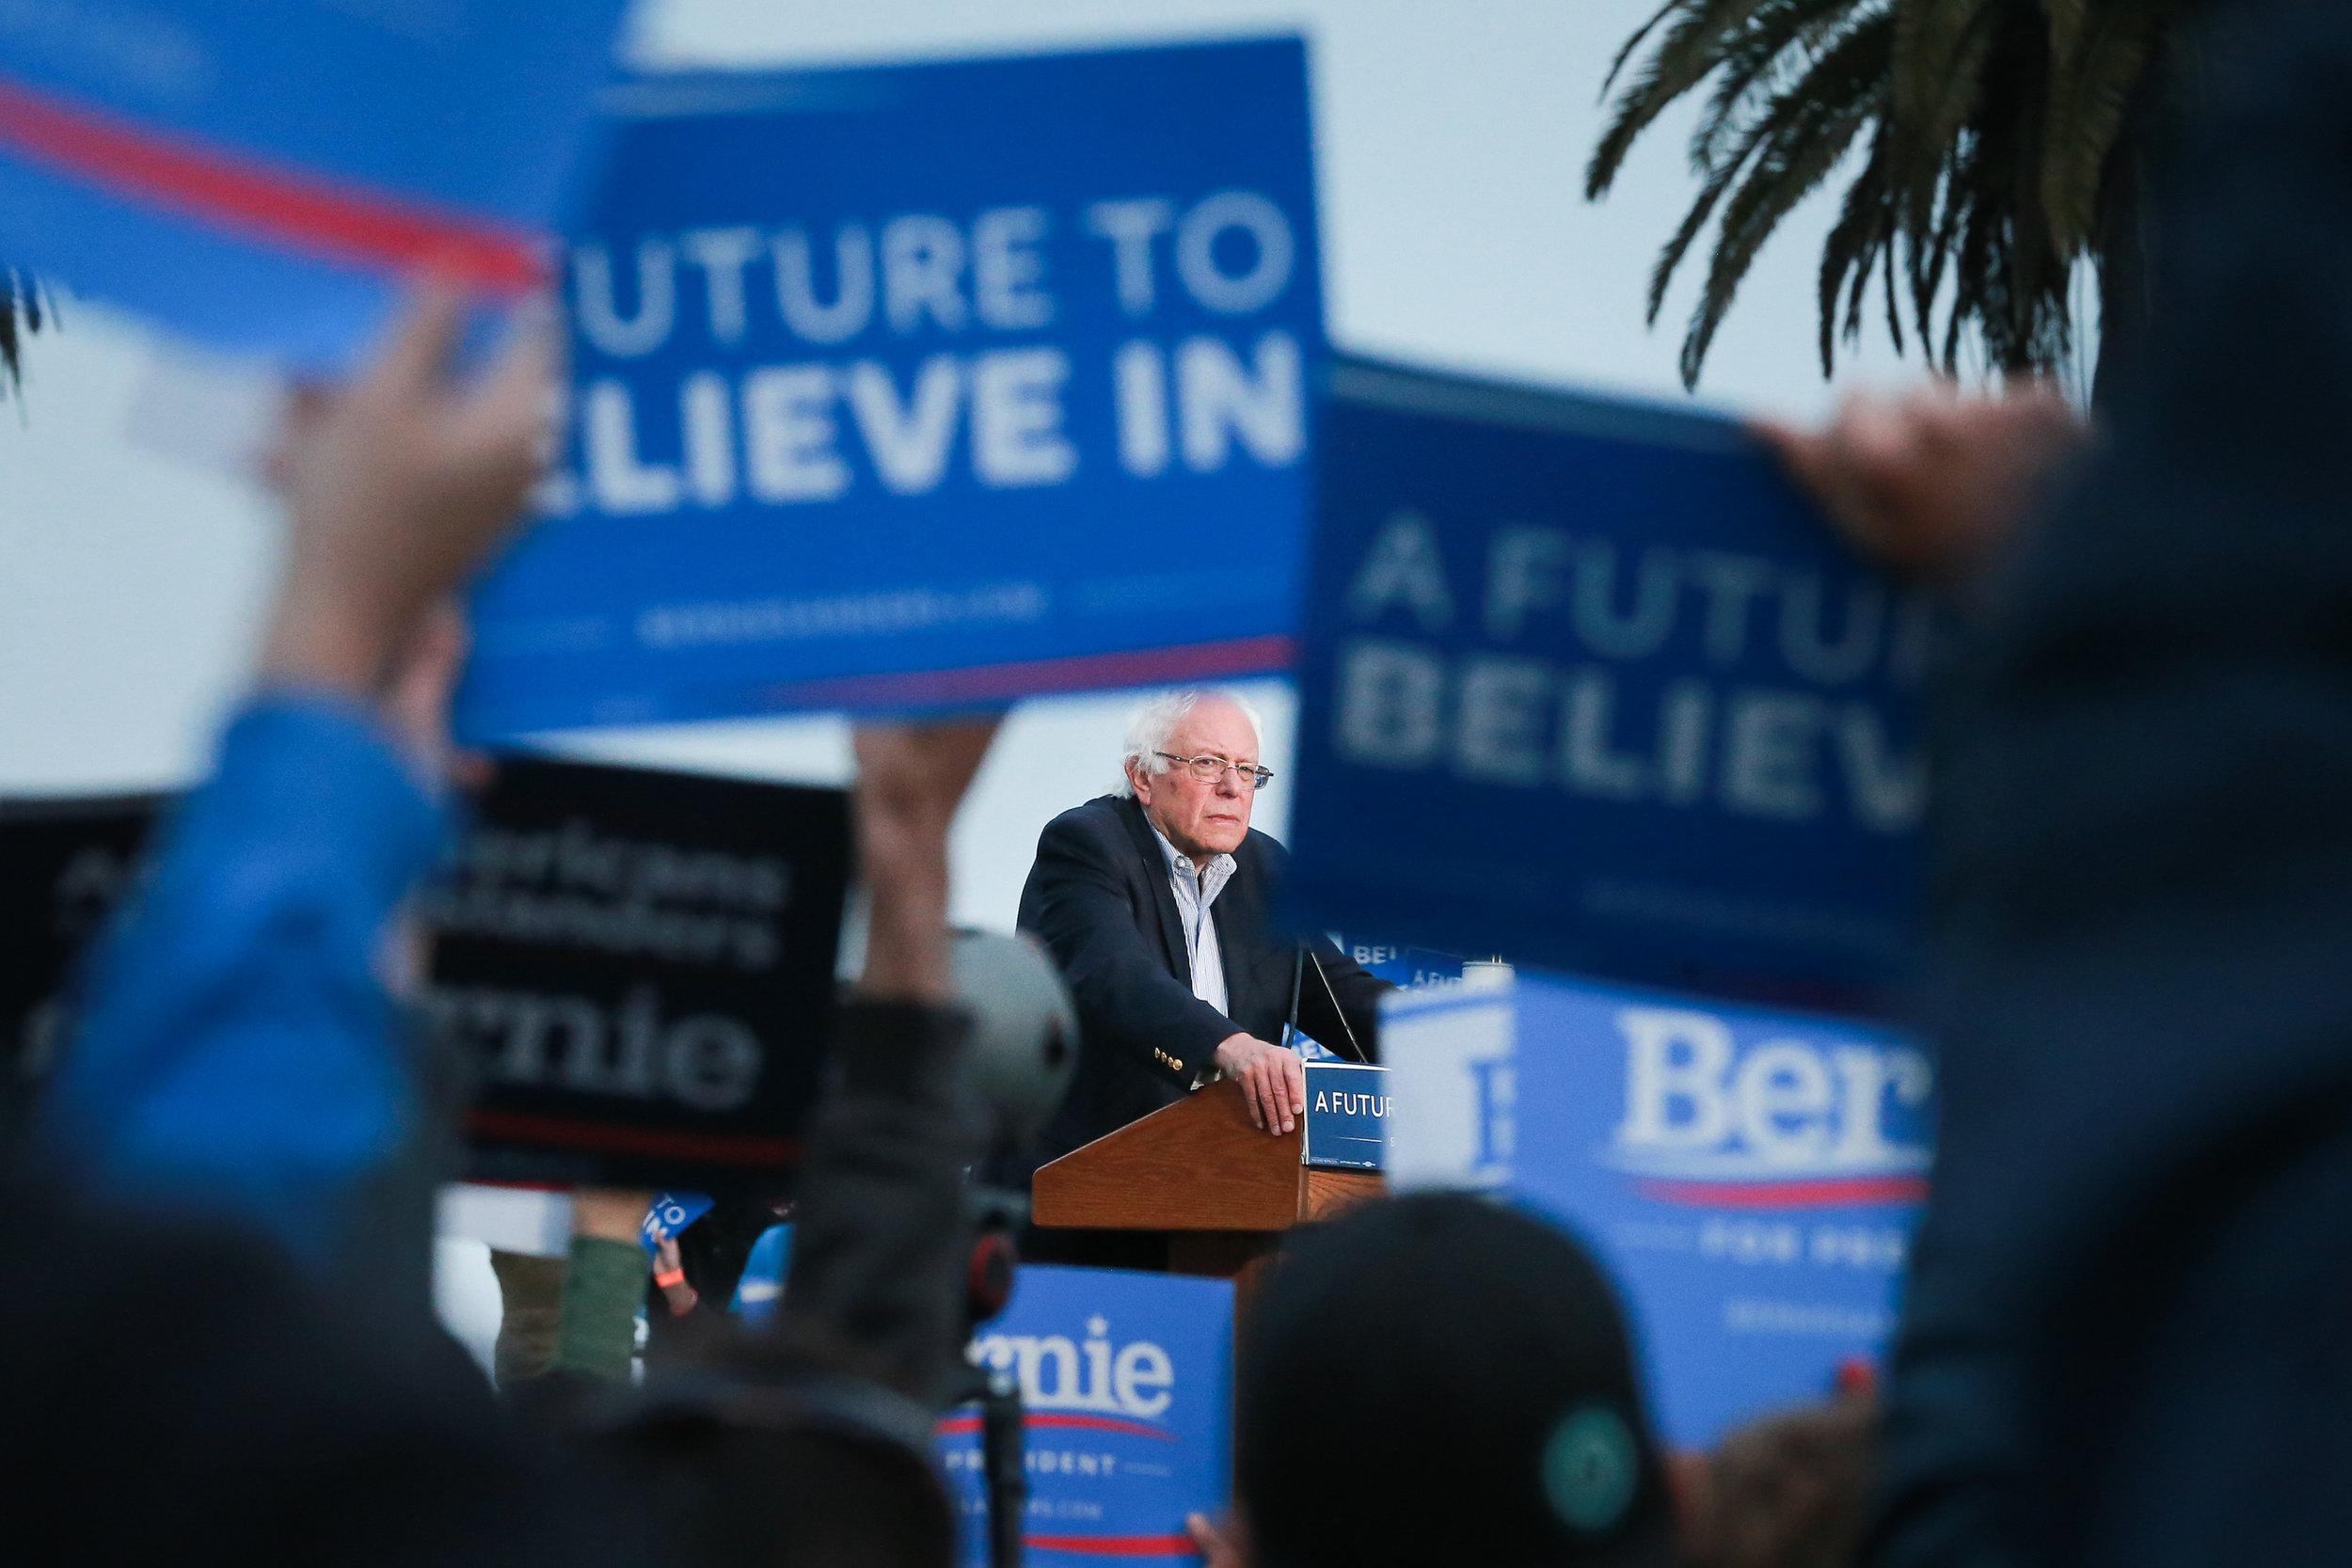 U.S. Sen. Bernie Sanders is seen at a campaign stop in San Francisco, California